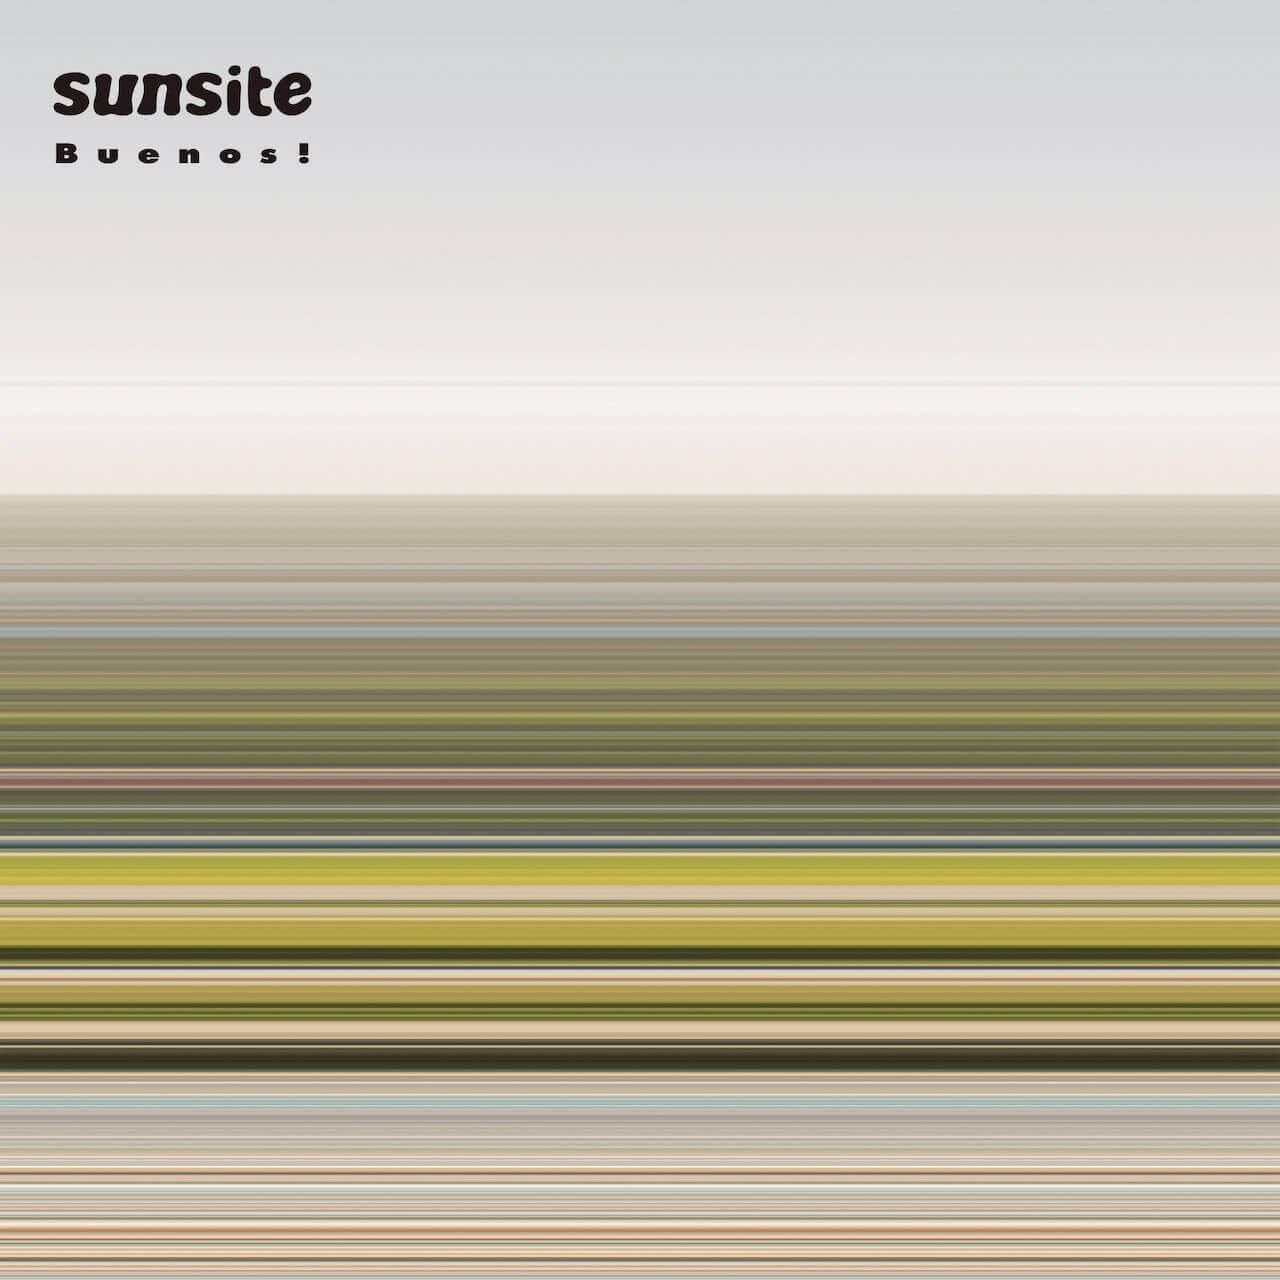 sunsite『Buenos!』──山本幹宗&永嶋柊吾による新バンドの「愛あるオマージュ」とまっすぐな姿勢 interview2105-sunsite-2